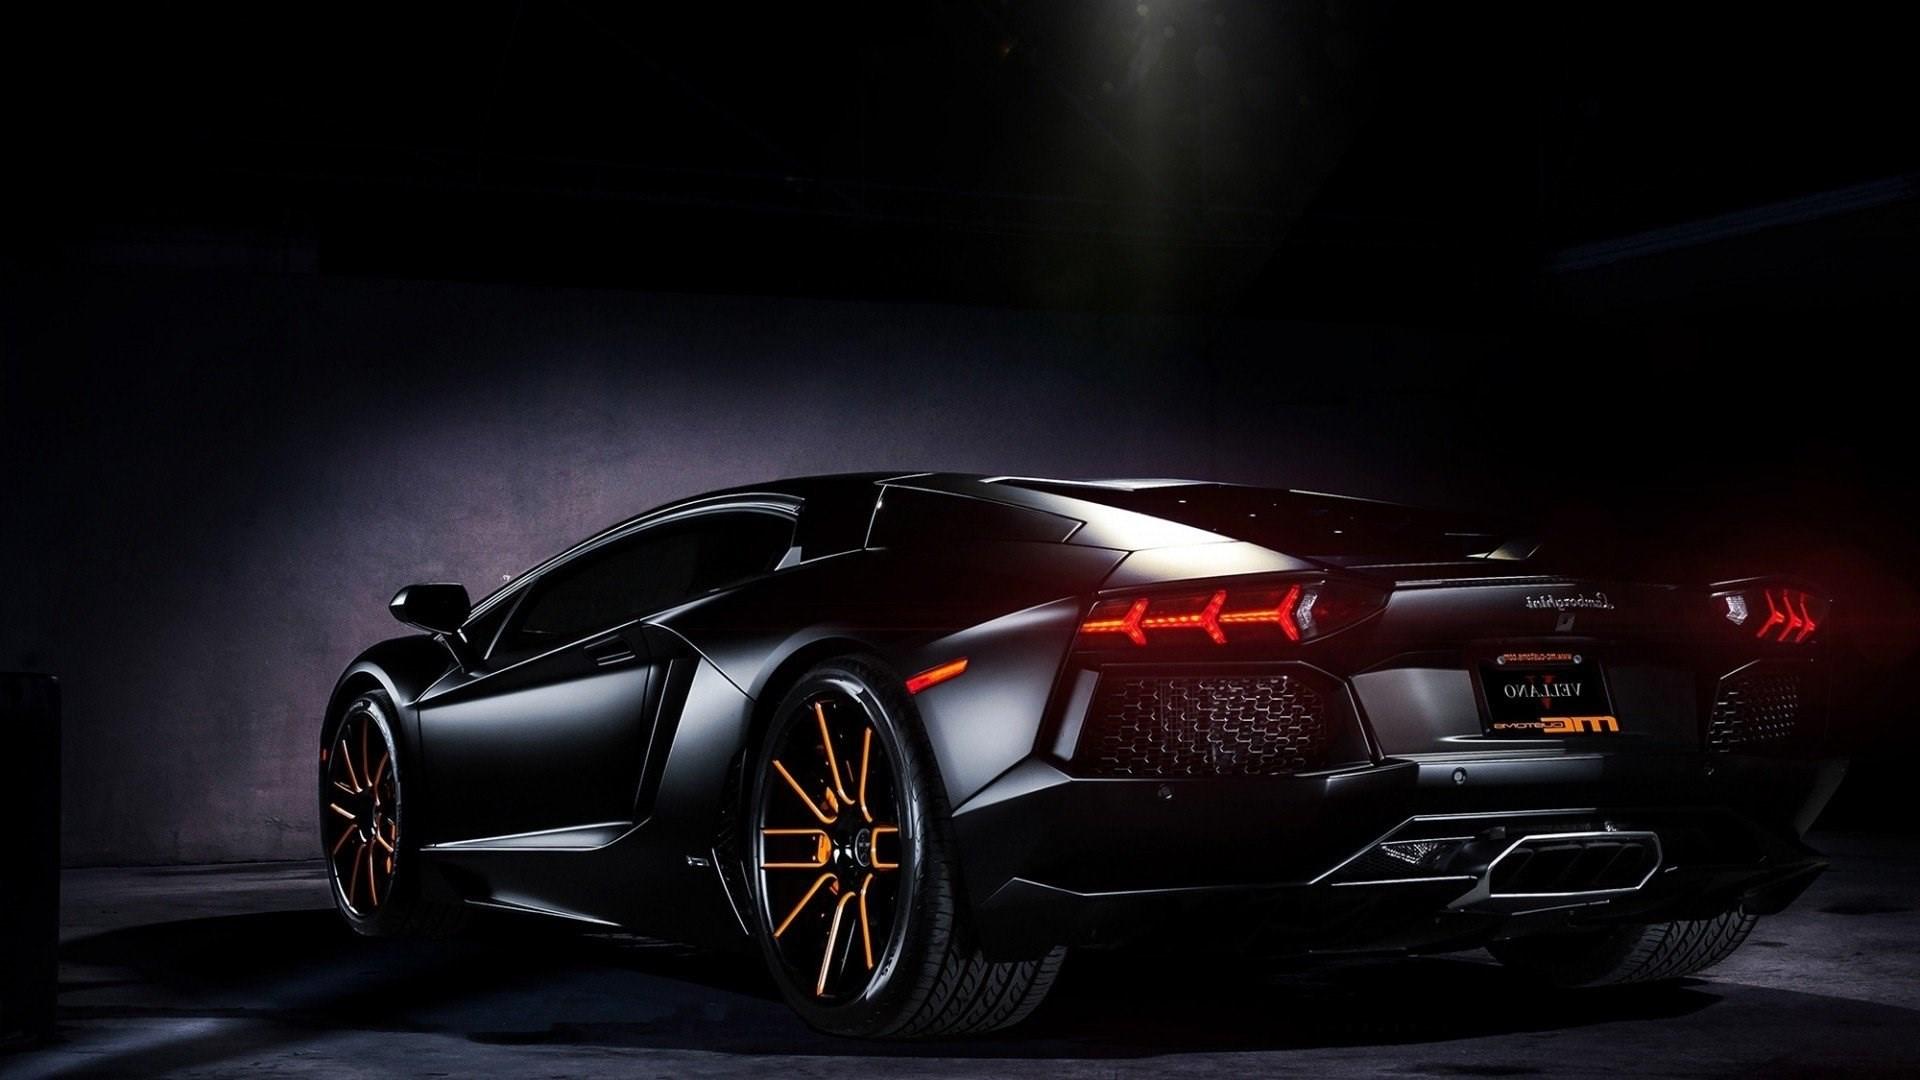 Lamborghini Veneno Hd Wallpapers 1366x768 Lamborghini Veneno